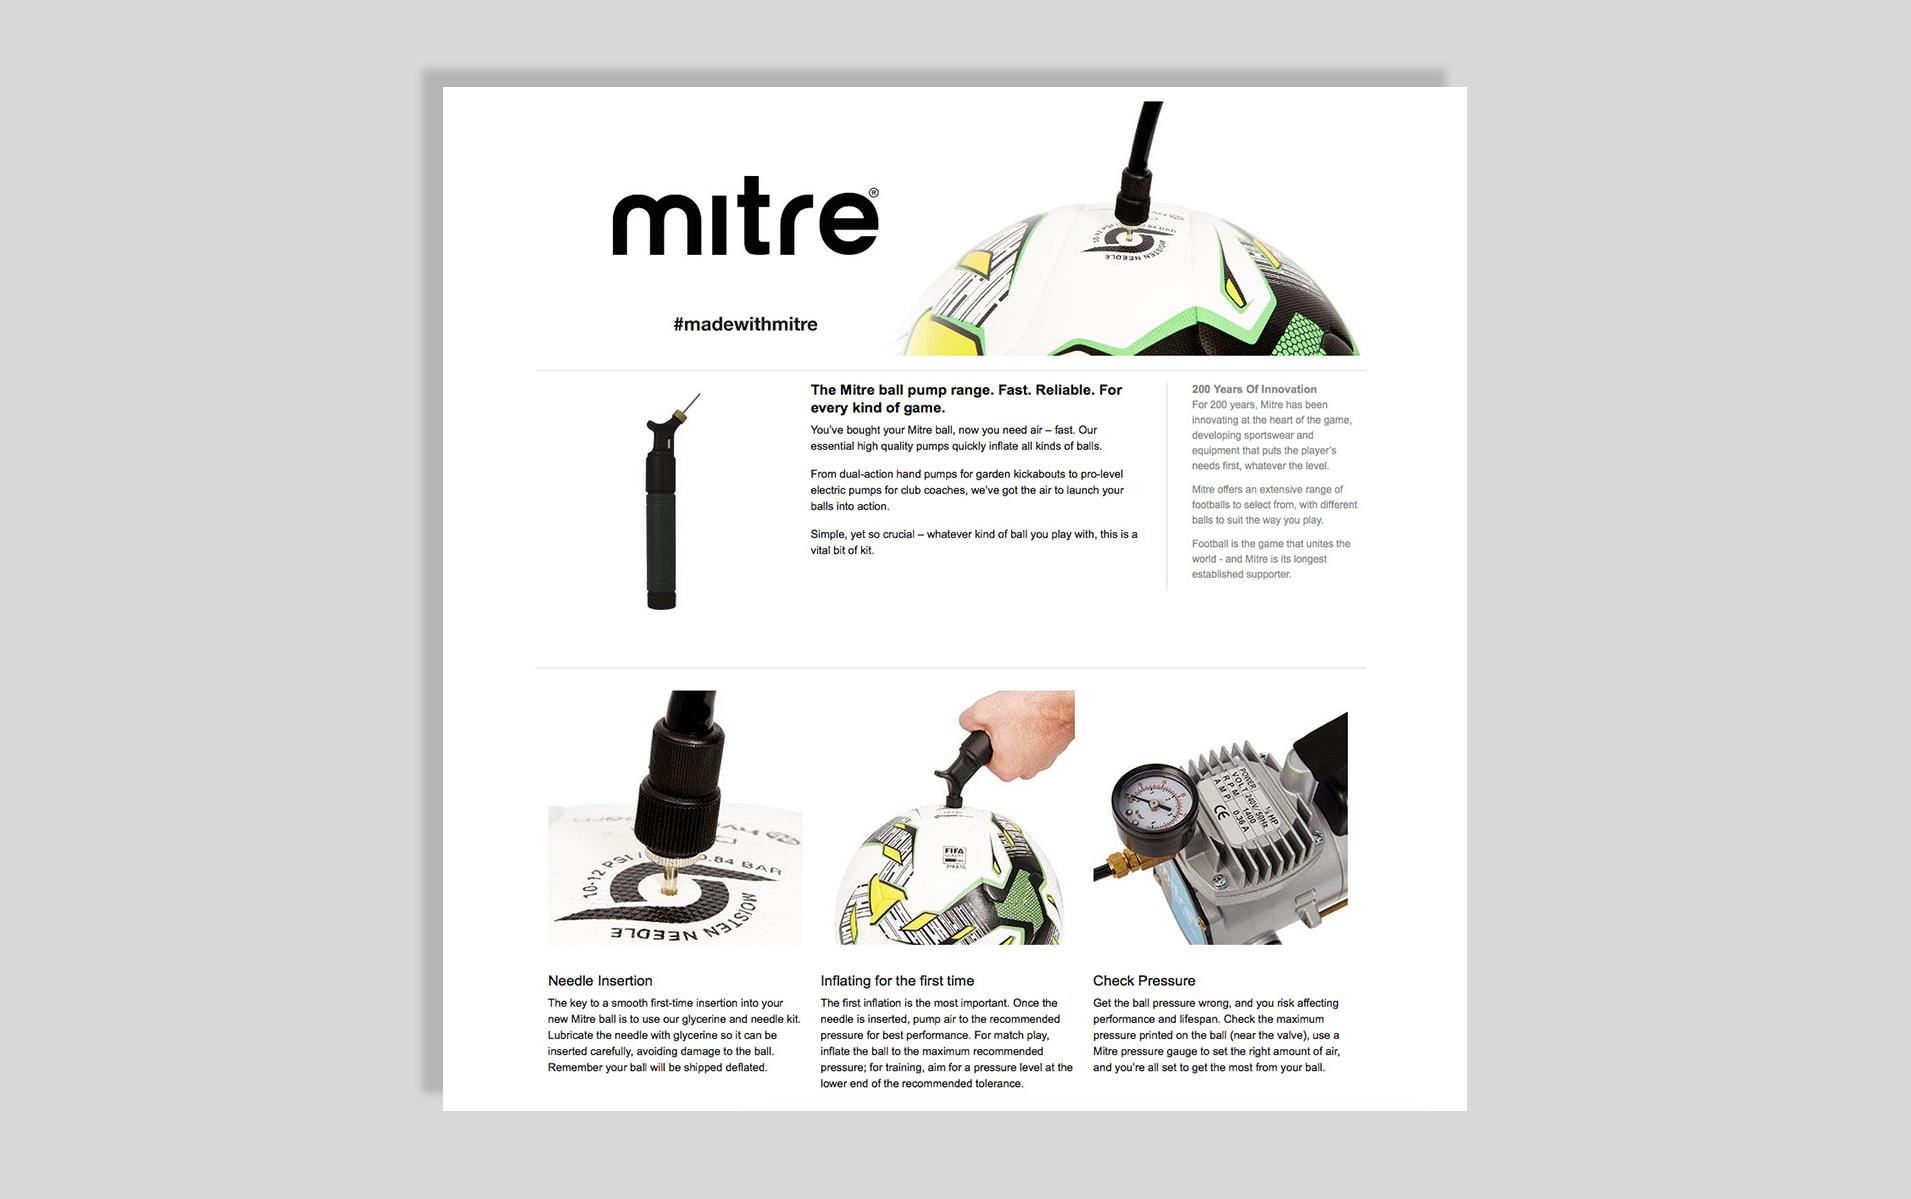 mitre_1_new.jpg